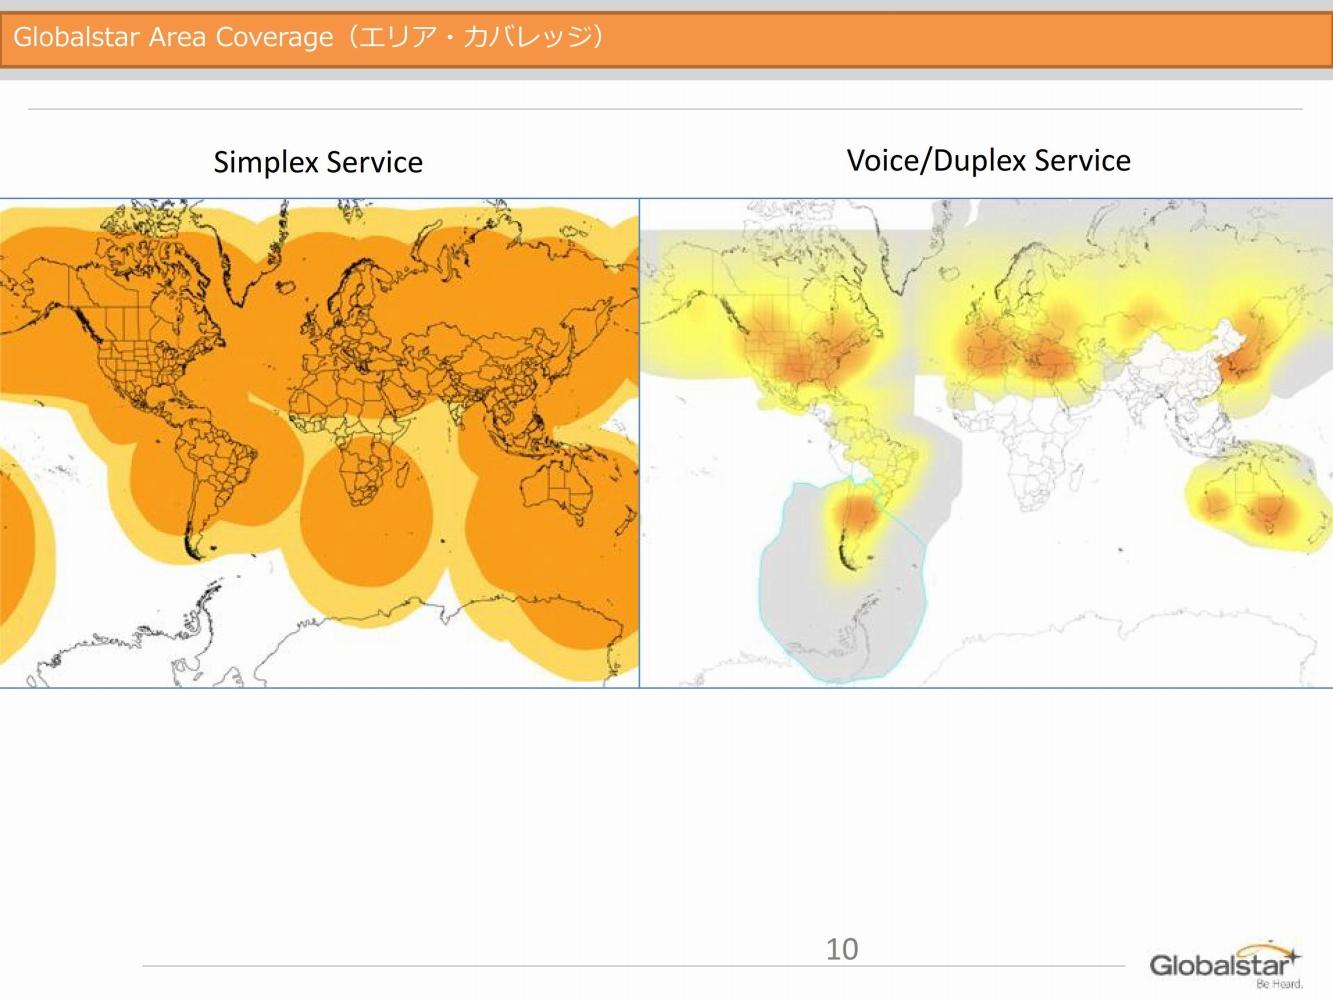 Globalstarの衛星通信のカバーエリア。左がsimplex(片方向通信)で、右が衛星携帯電話などの双方向通信の利用可能エリア(画像提供:株式会社Globalstar Japan)